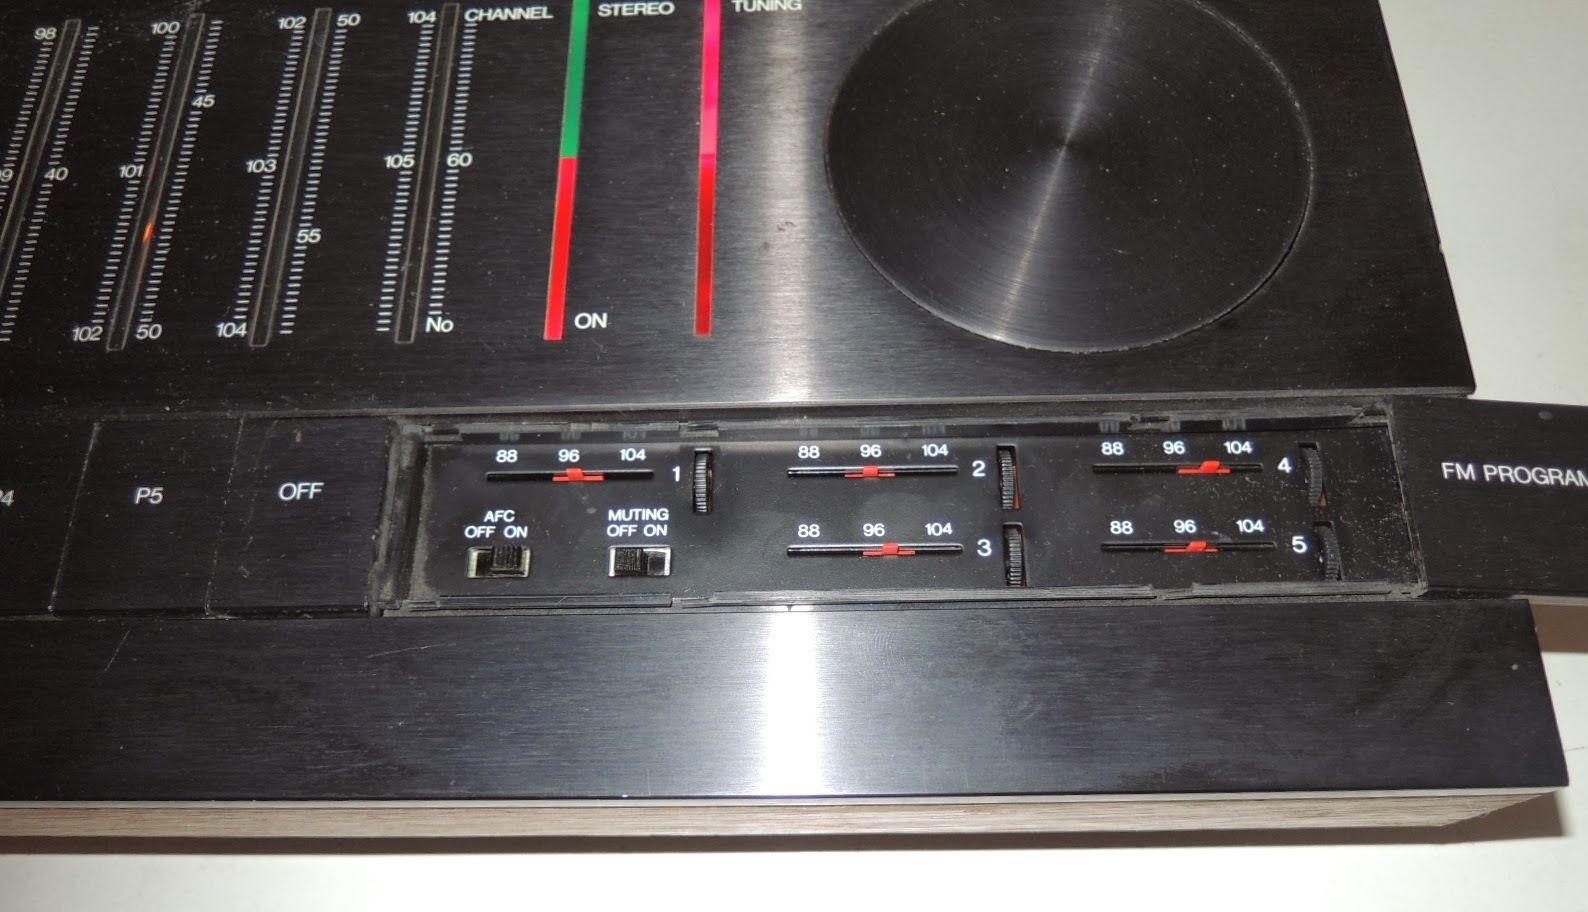 Beomaster 3400 Type 2802